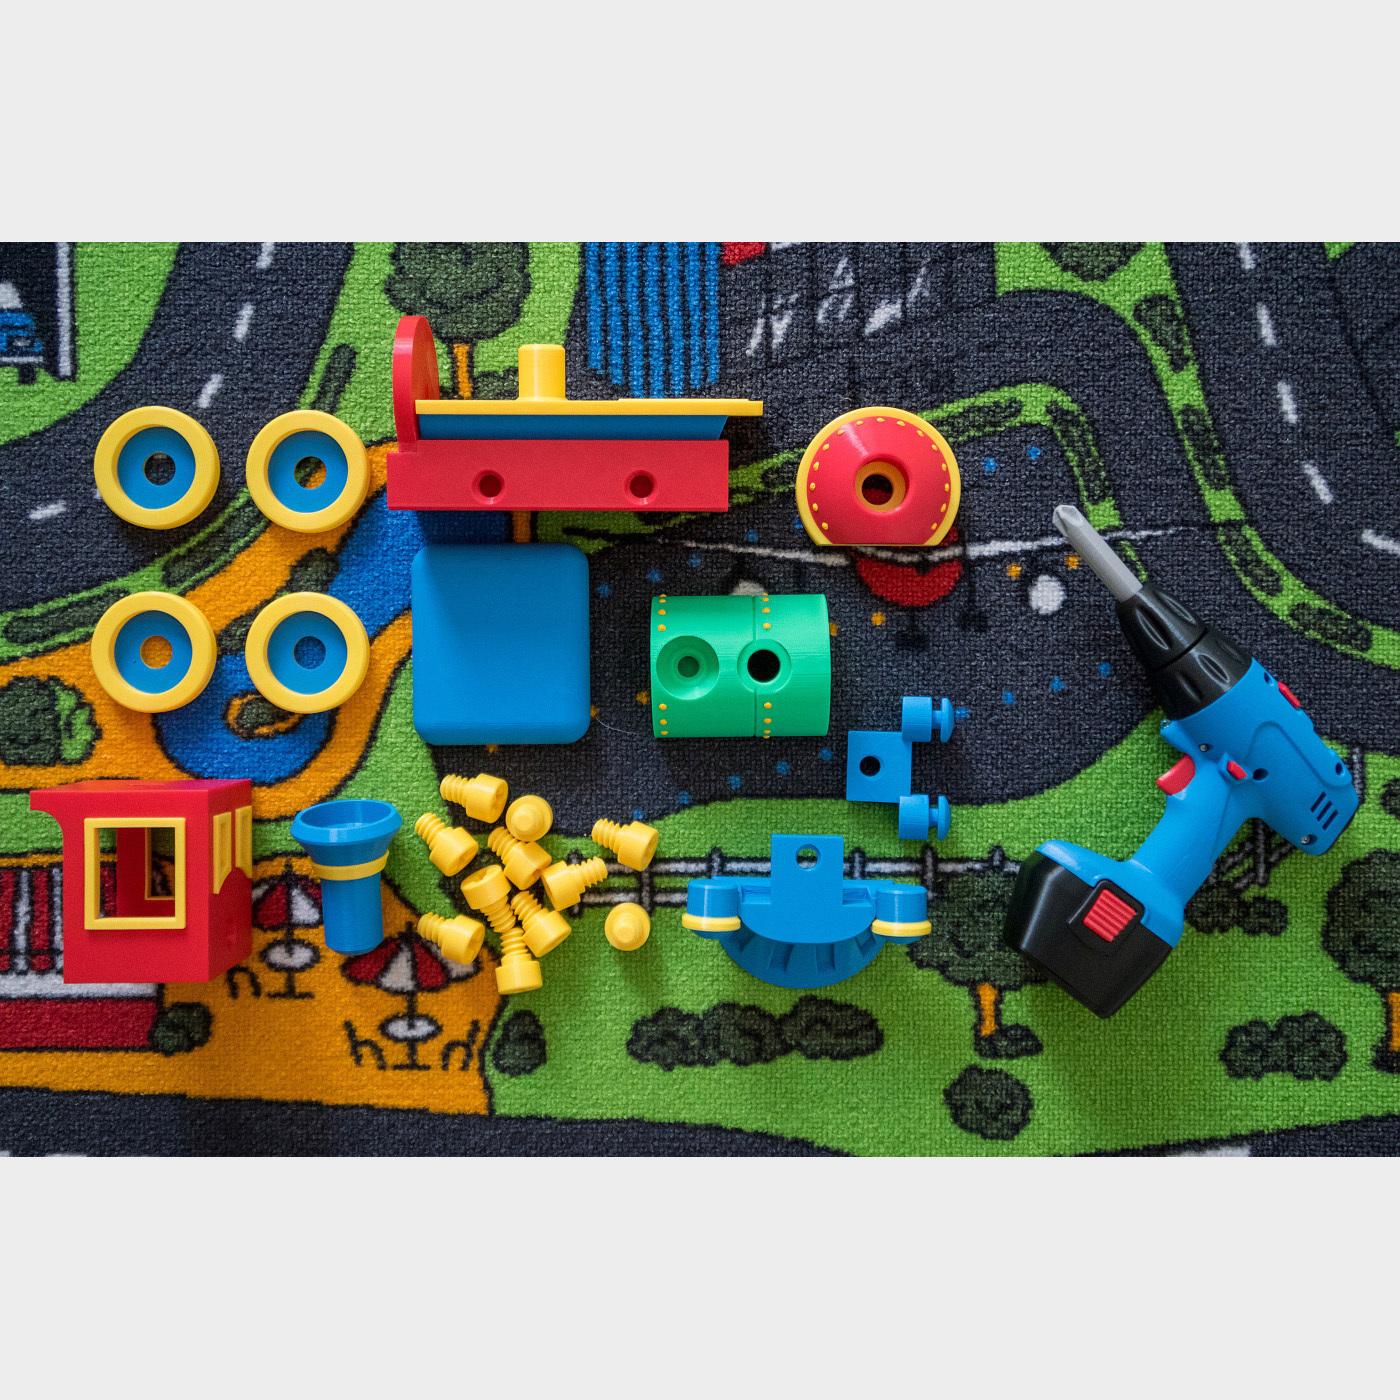 loco_set.jpg Download STL file Toy train construction set - whole train combo • 3D print object, kozakm